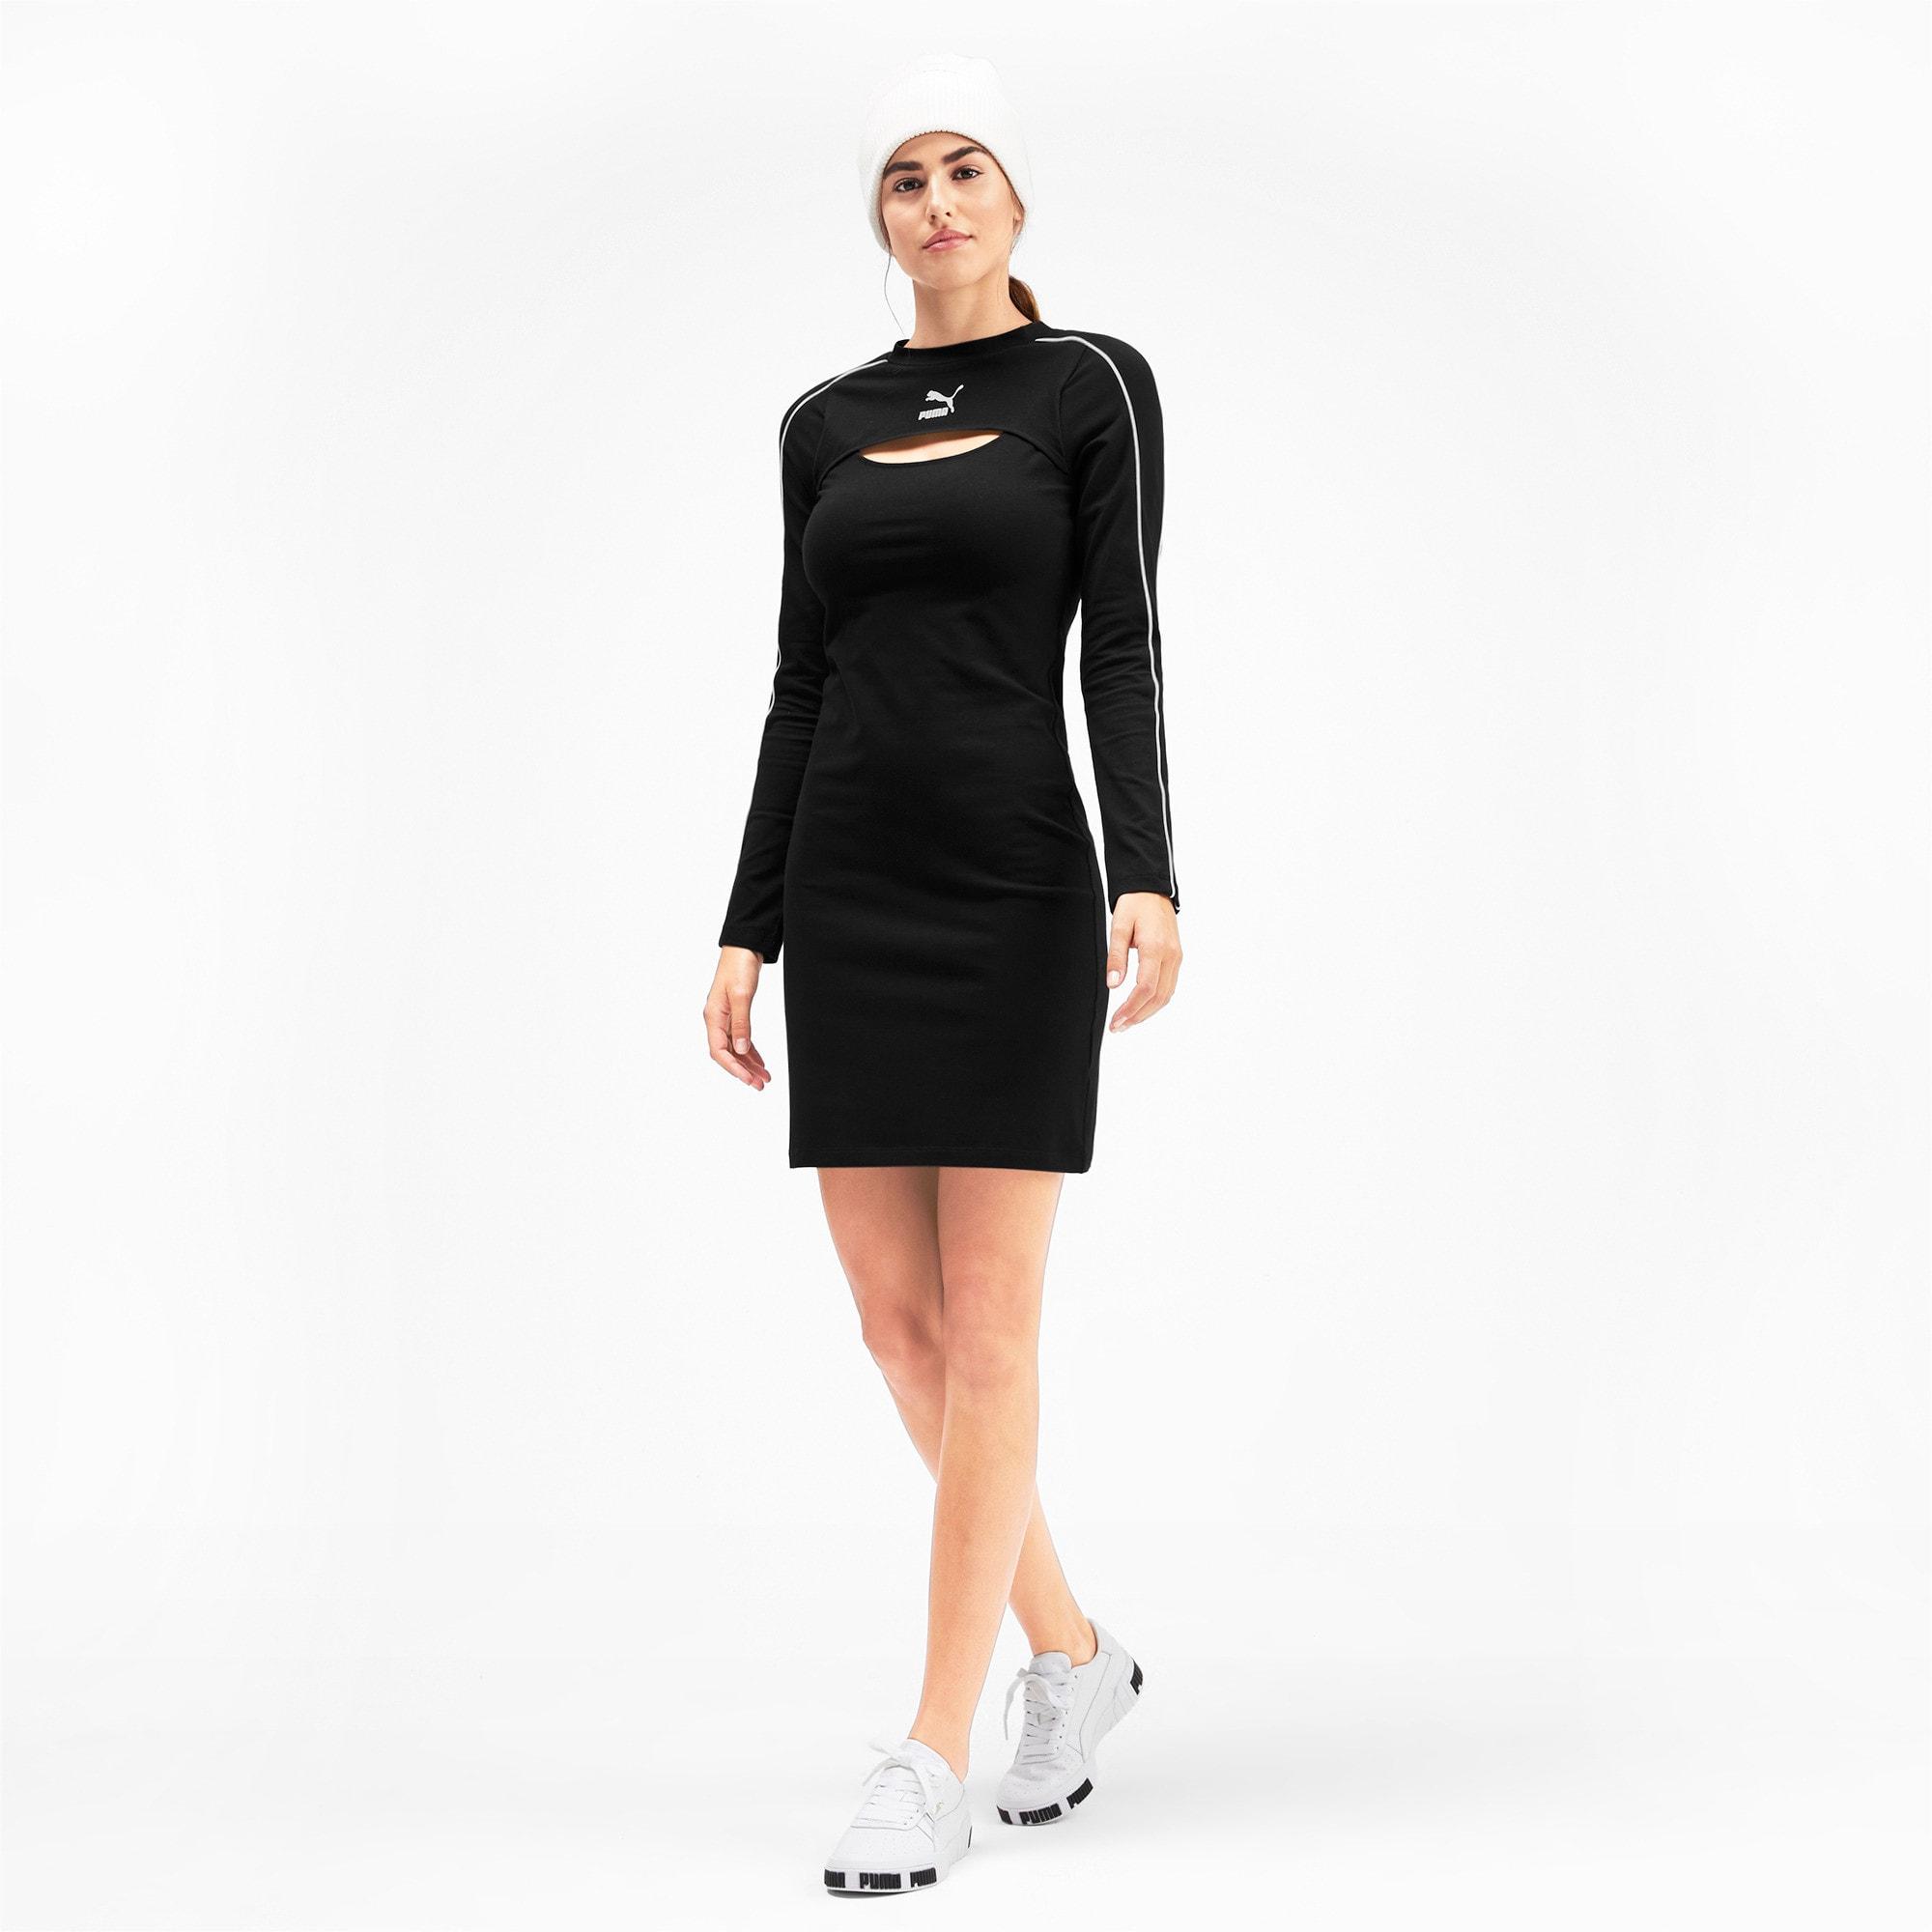 Thumbnail 4 of CLASSICS ウィメンズ ドレス, Cotton Black, medium-JPN